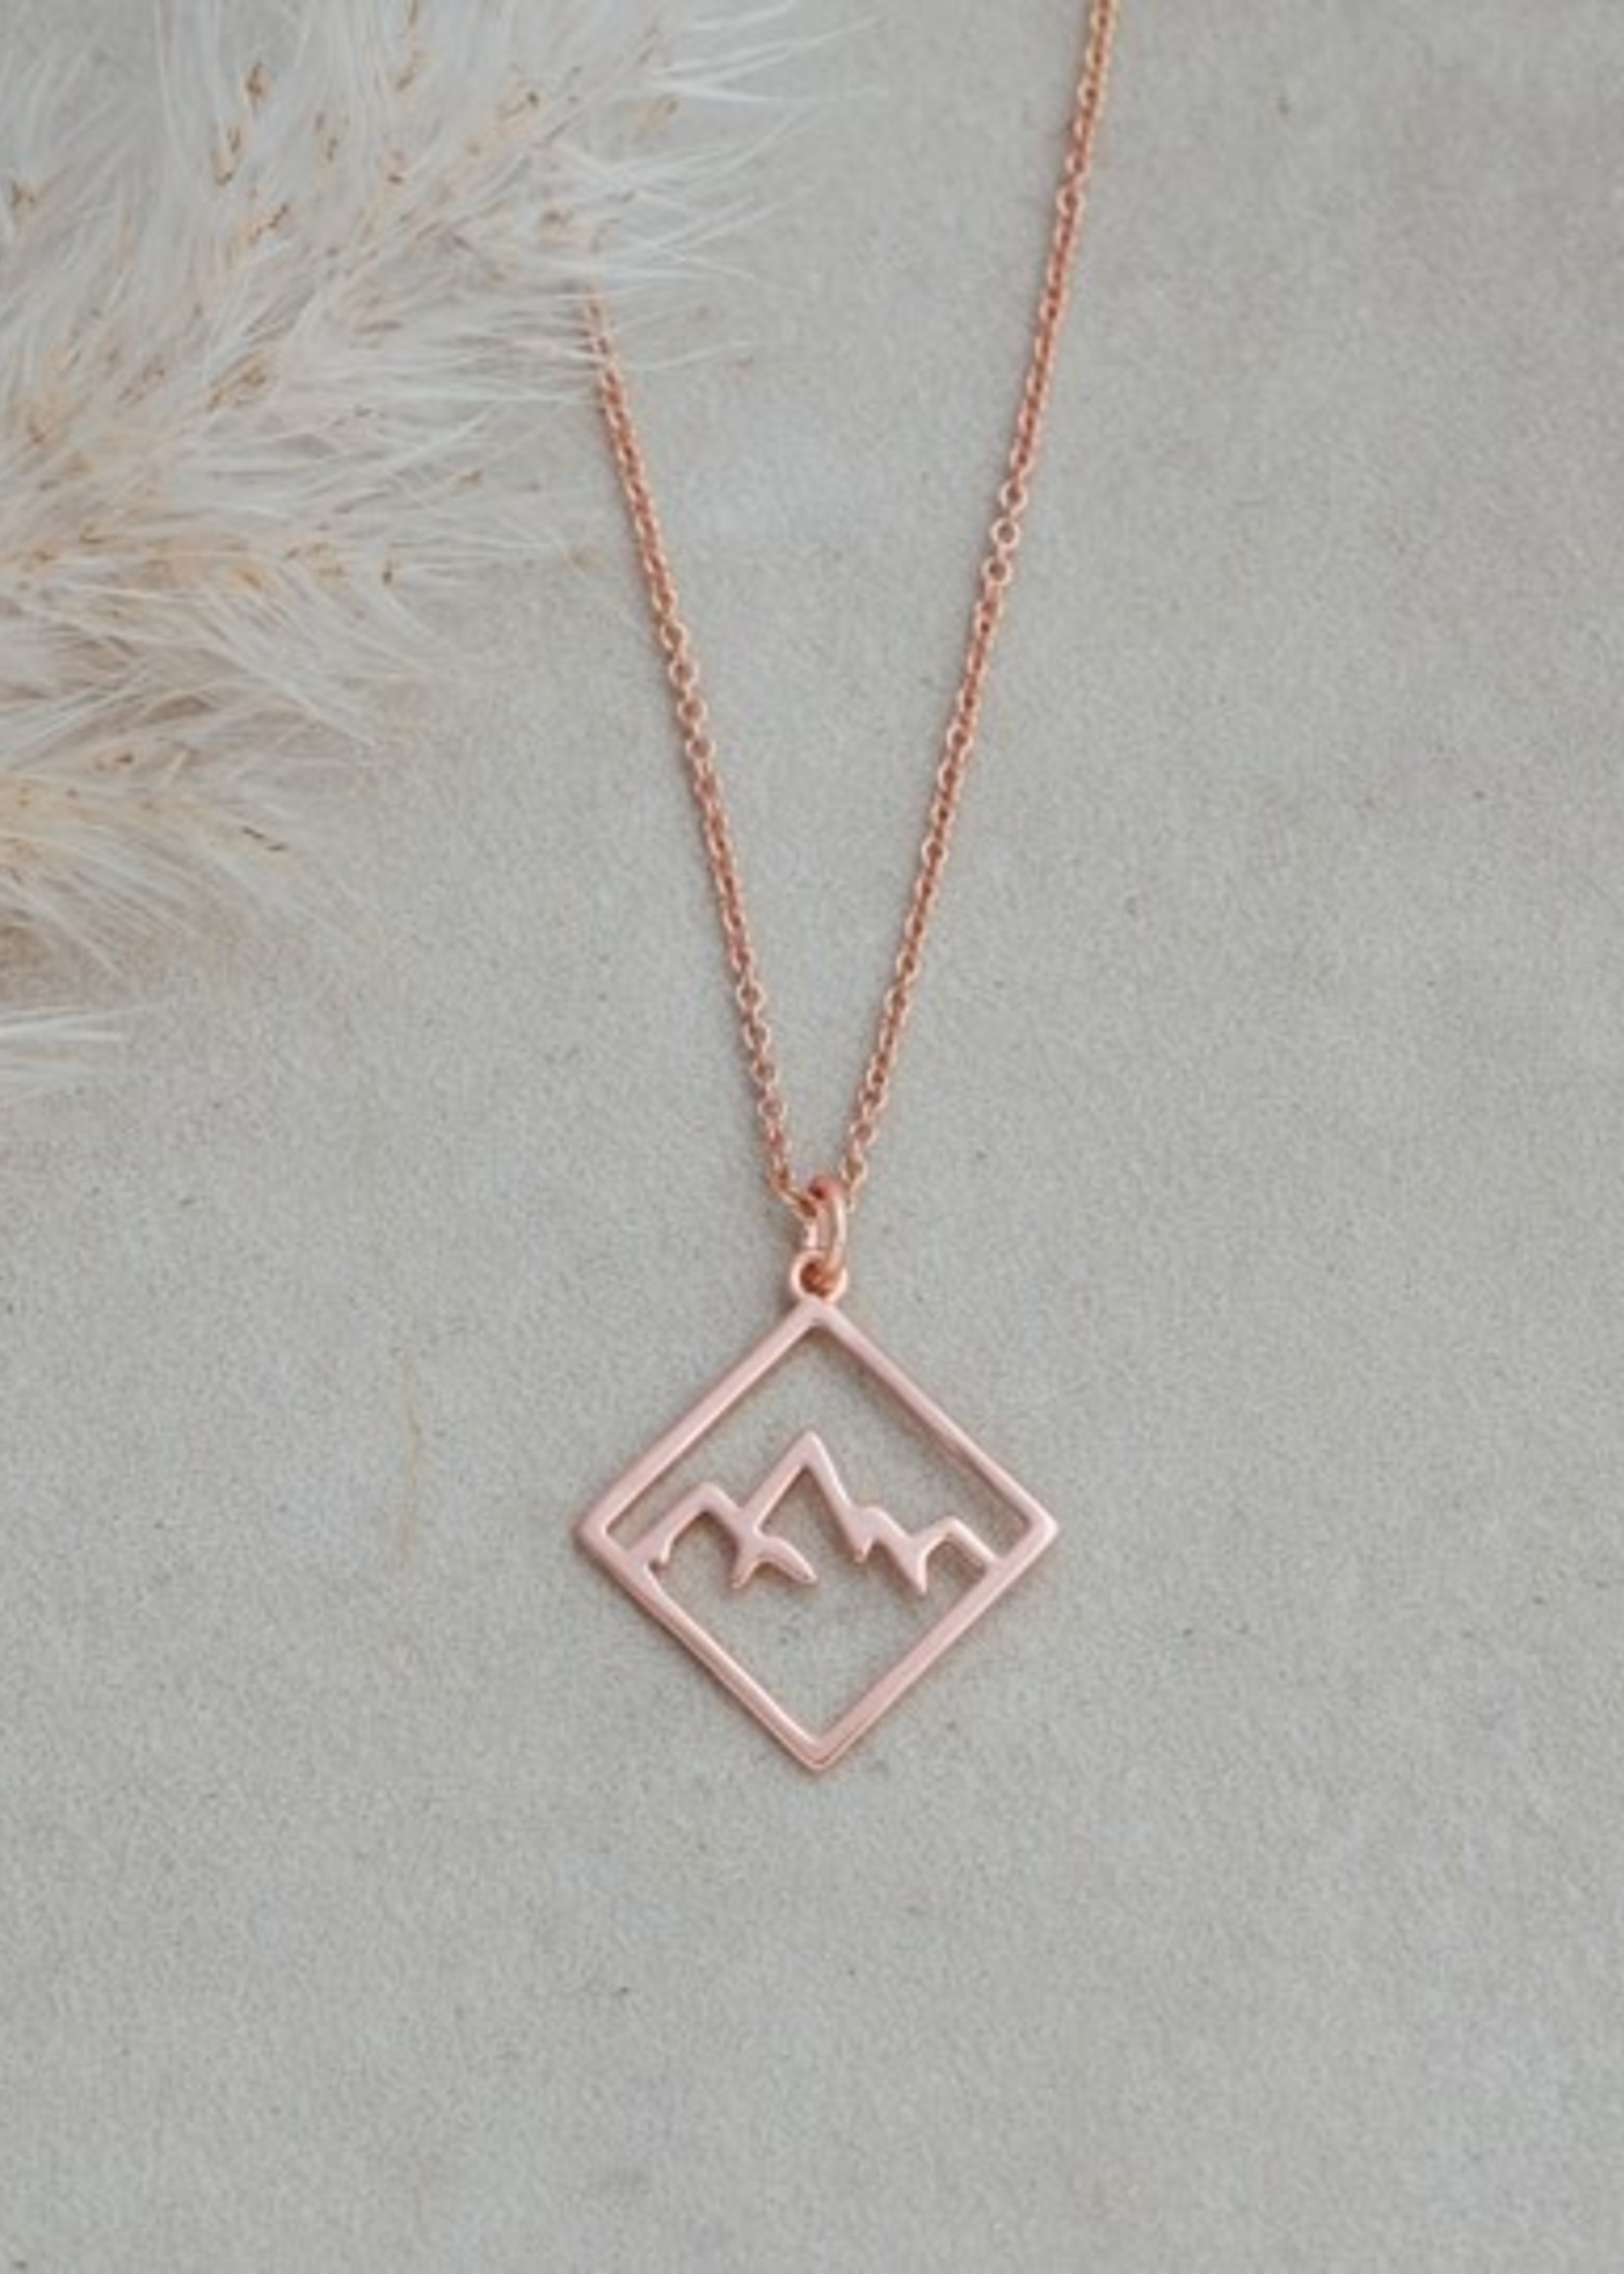 Glee Jewelry Ridge Necklace Rose Gold